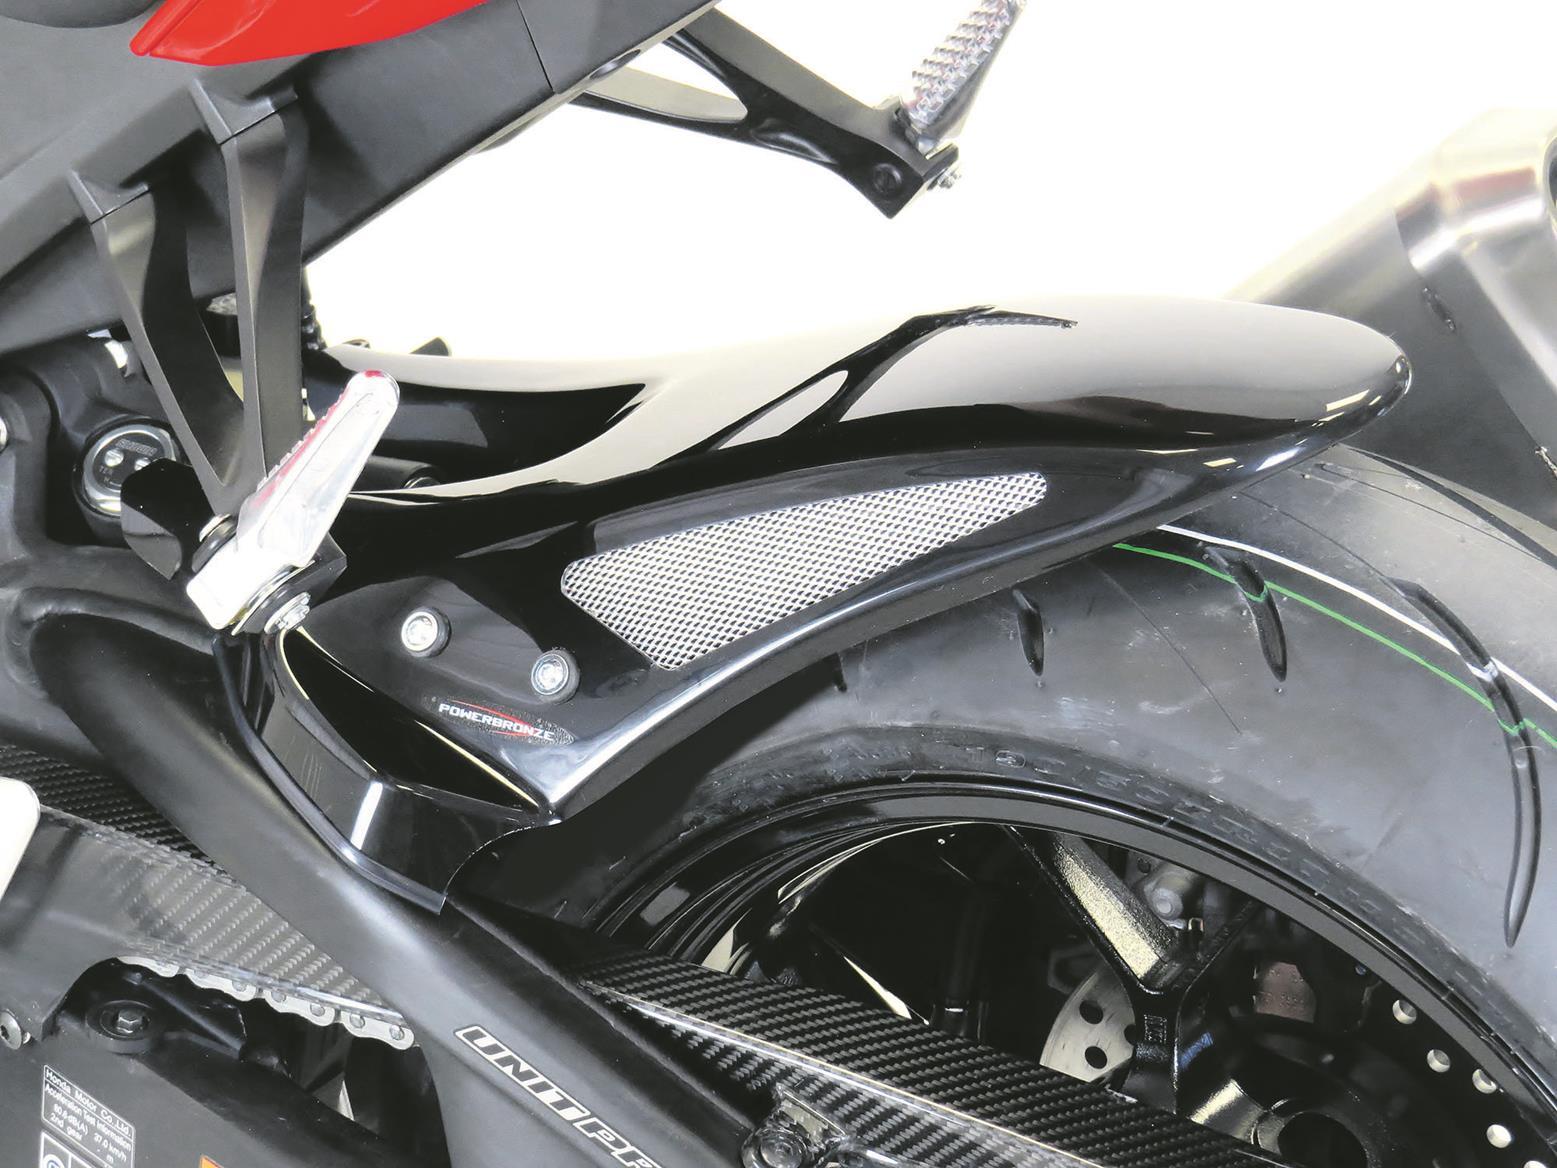 Fox Shock For Ducati Hypermotard Rear